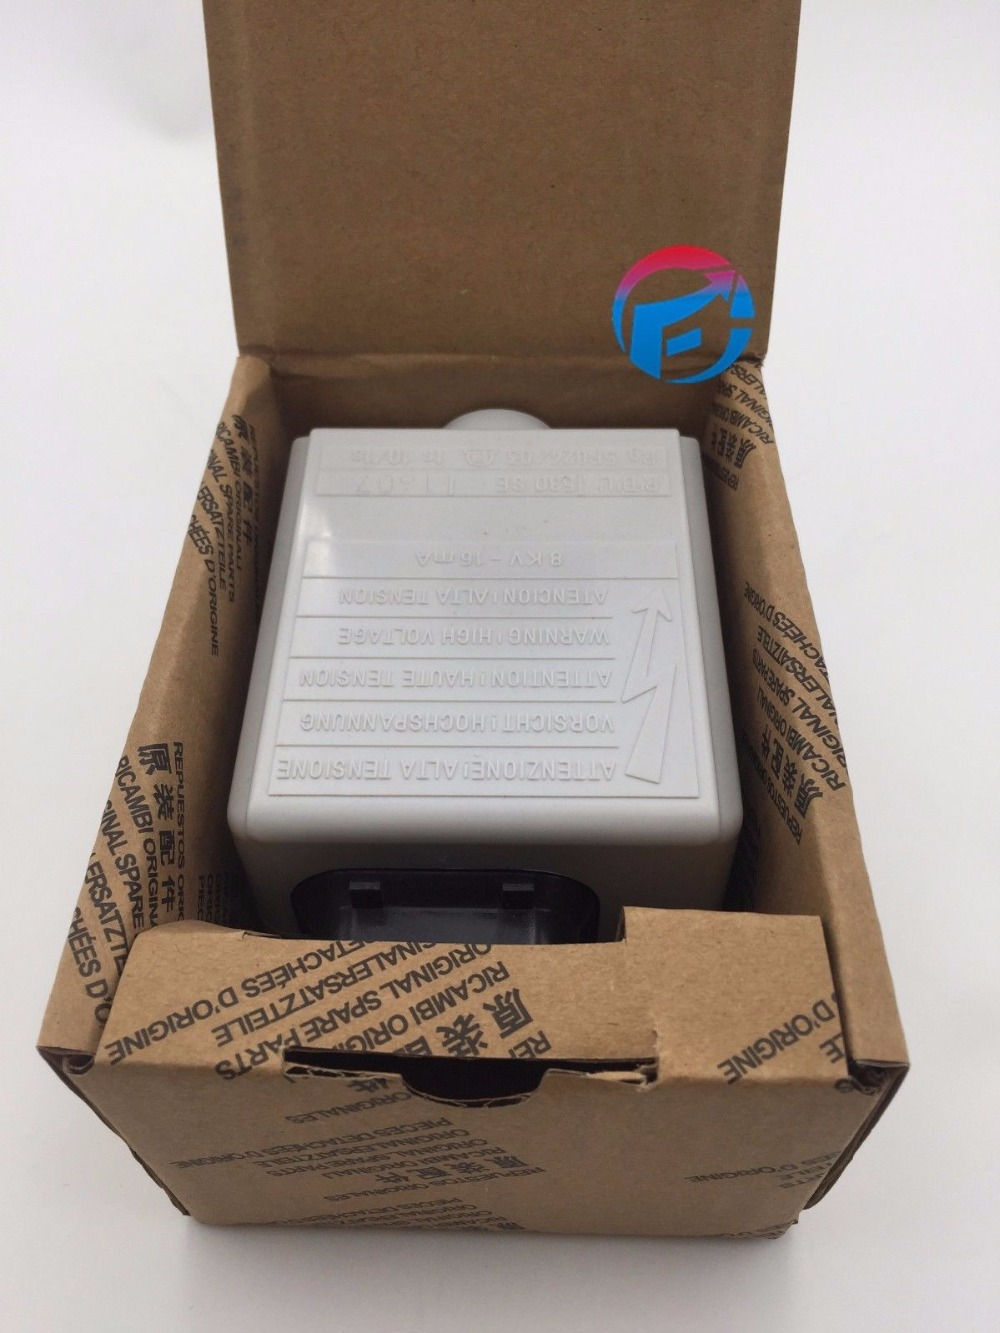 Original RIELLO CONTROL BOX 530SE + 40G Combustion Flame Detector Flame Sensor